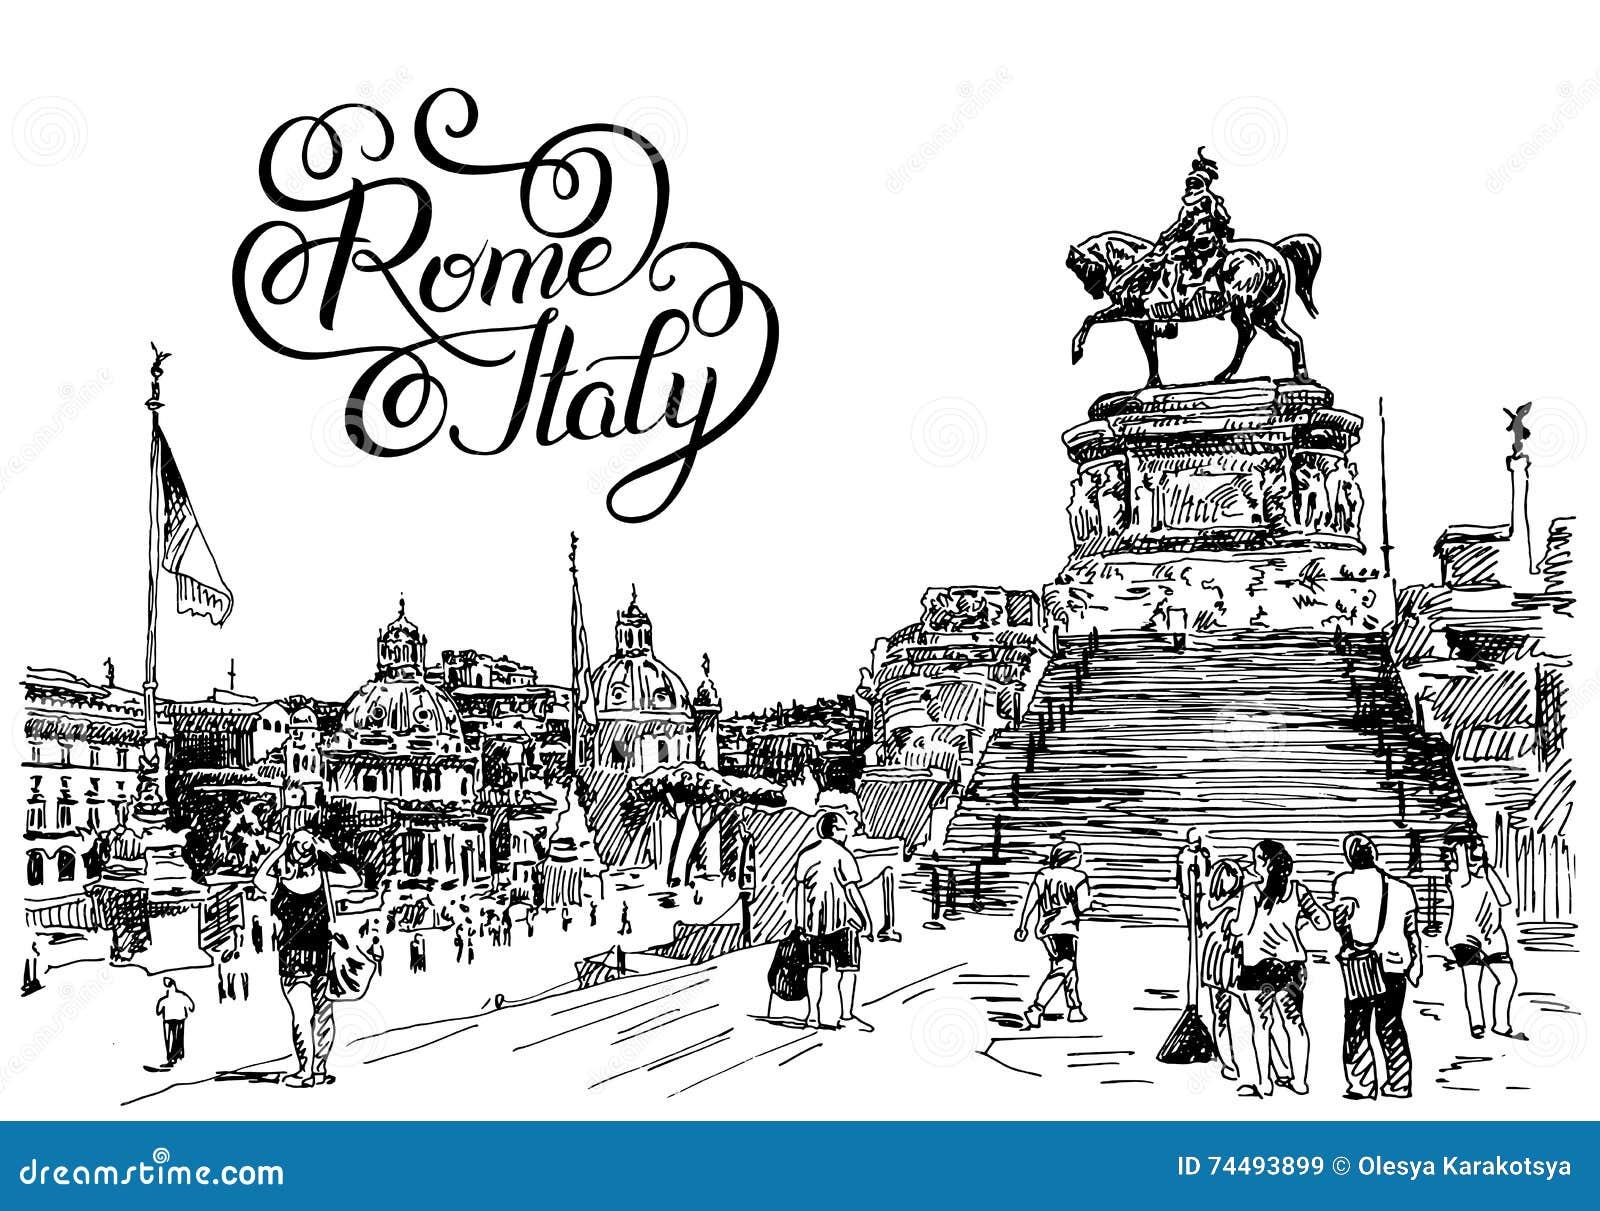 El dibujo de la mano del bosquejo del paisaje urbano famoso de Roma Italia con la mano dejó